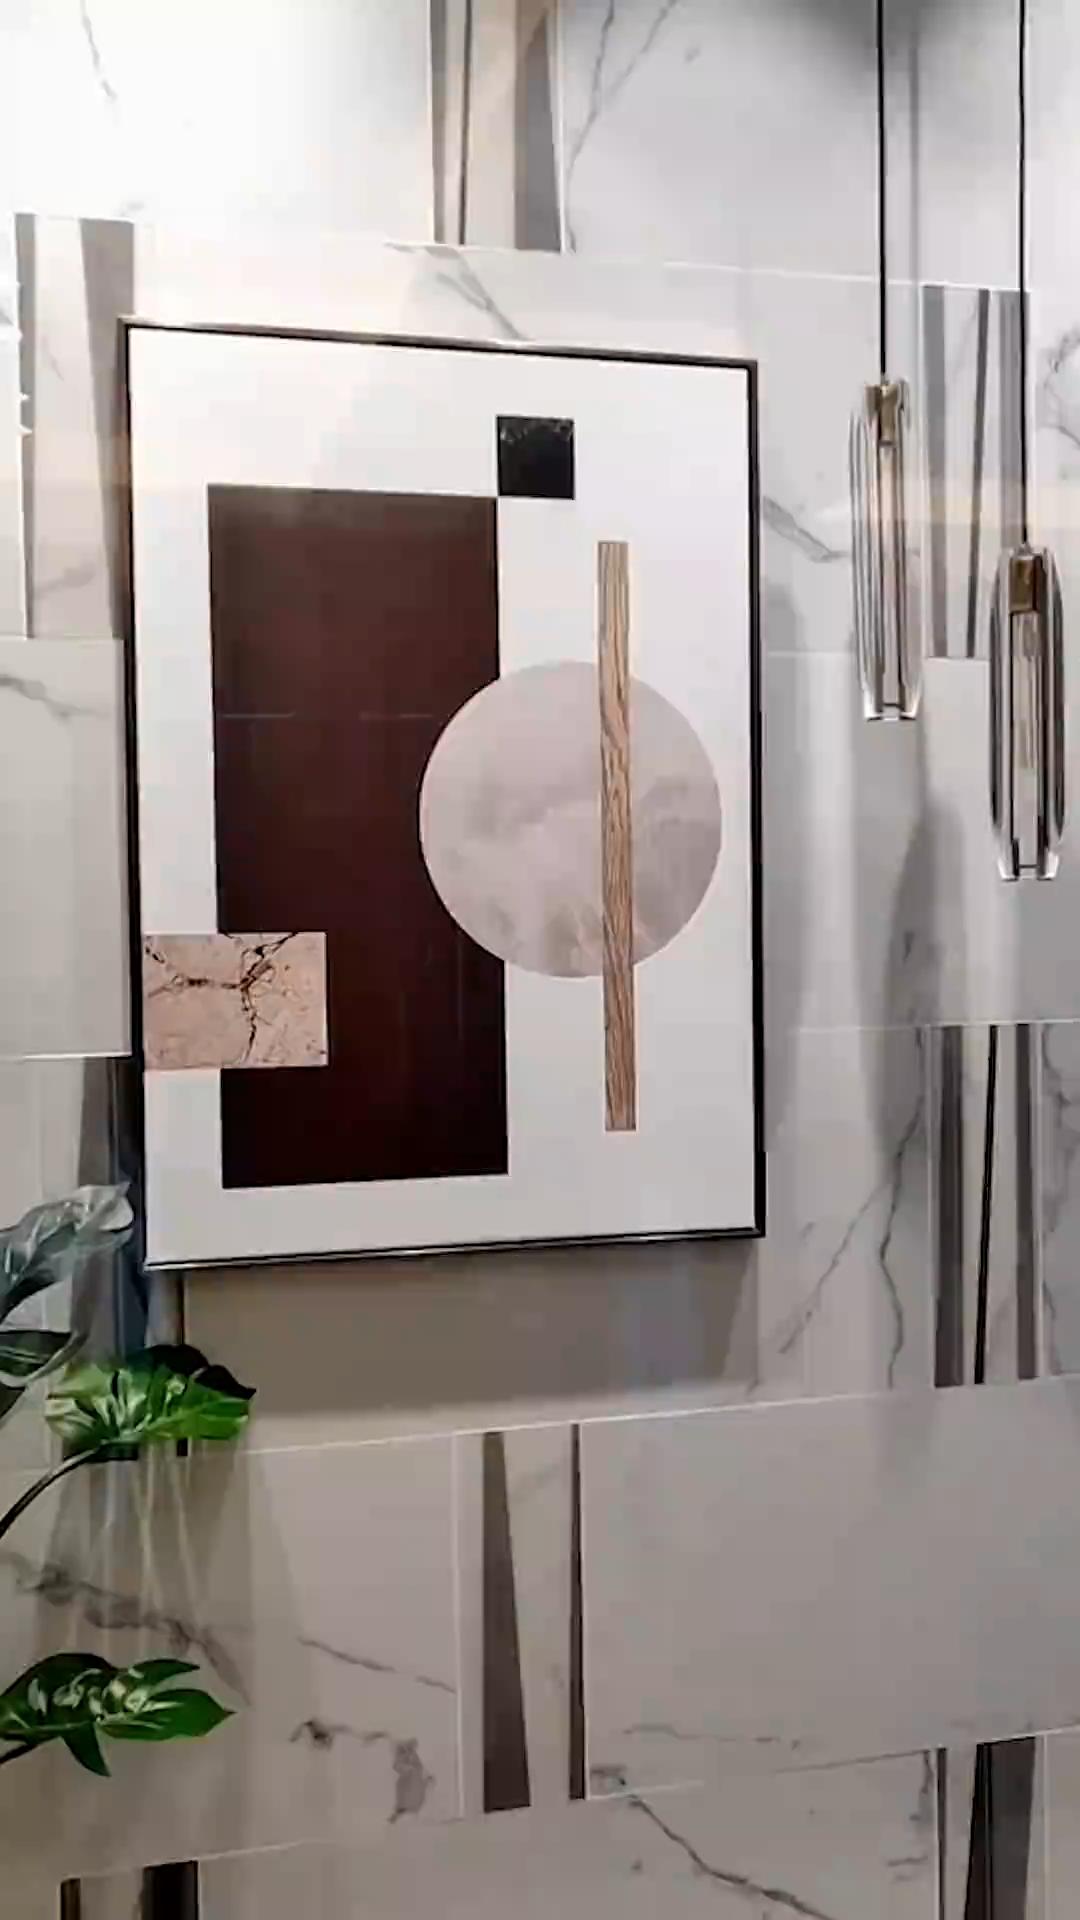 Cabinet Makers Near Me Video In 2020 Decor Design Your Dream House Small Apartment Interior